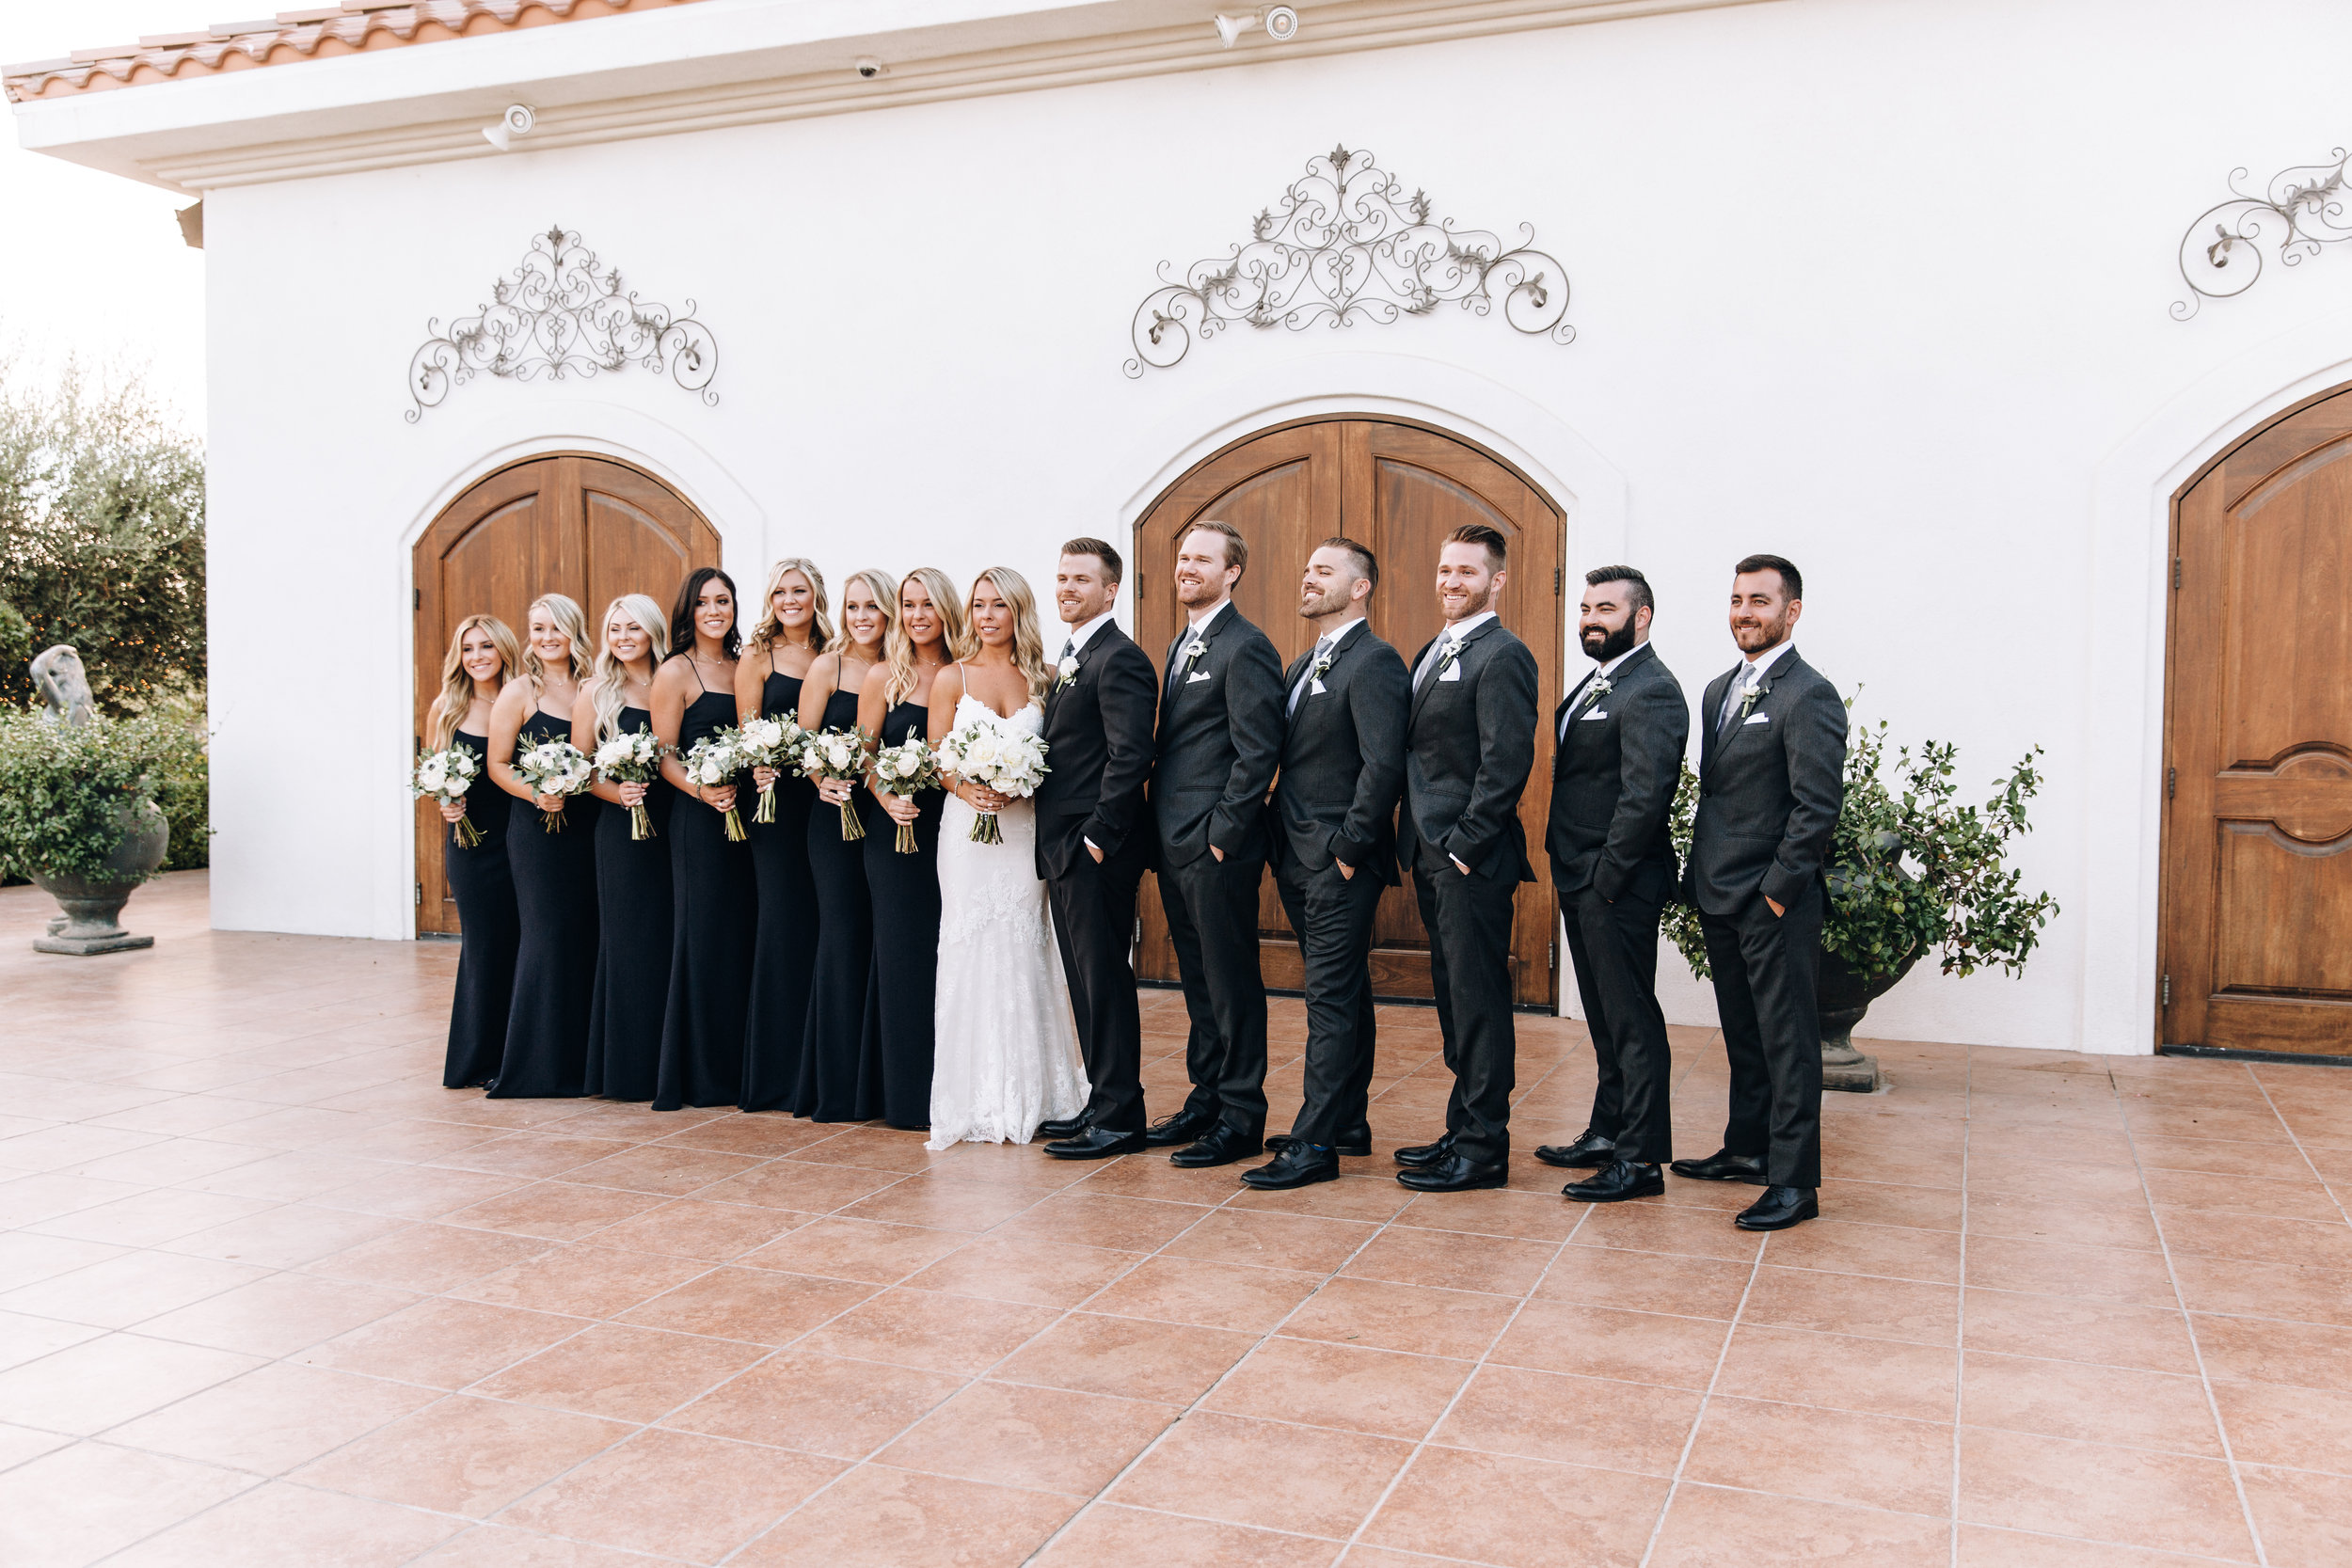 KaraNixonWeddings-Temecula-Wedding-28.jpg